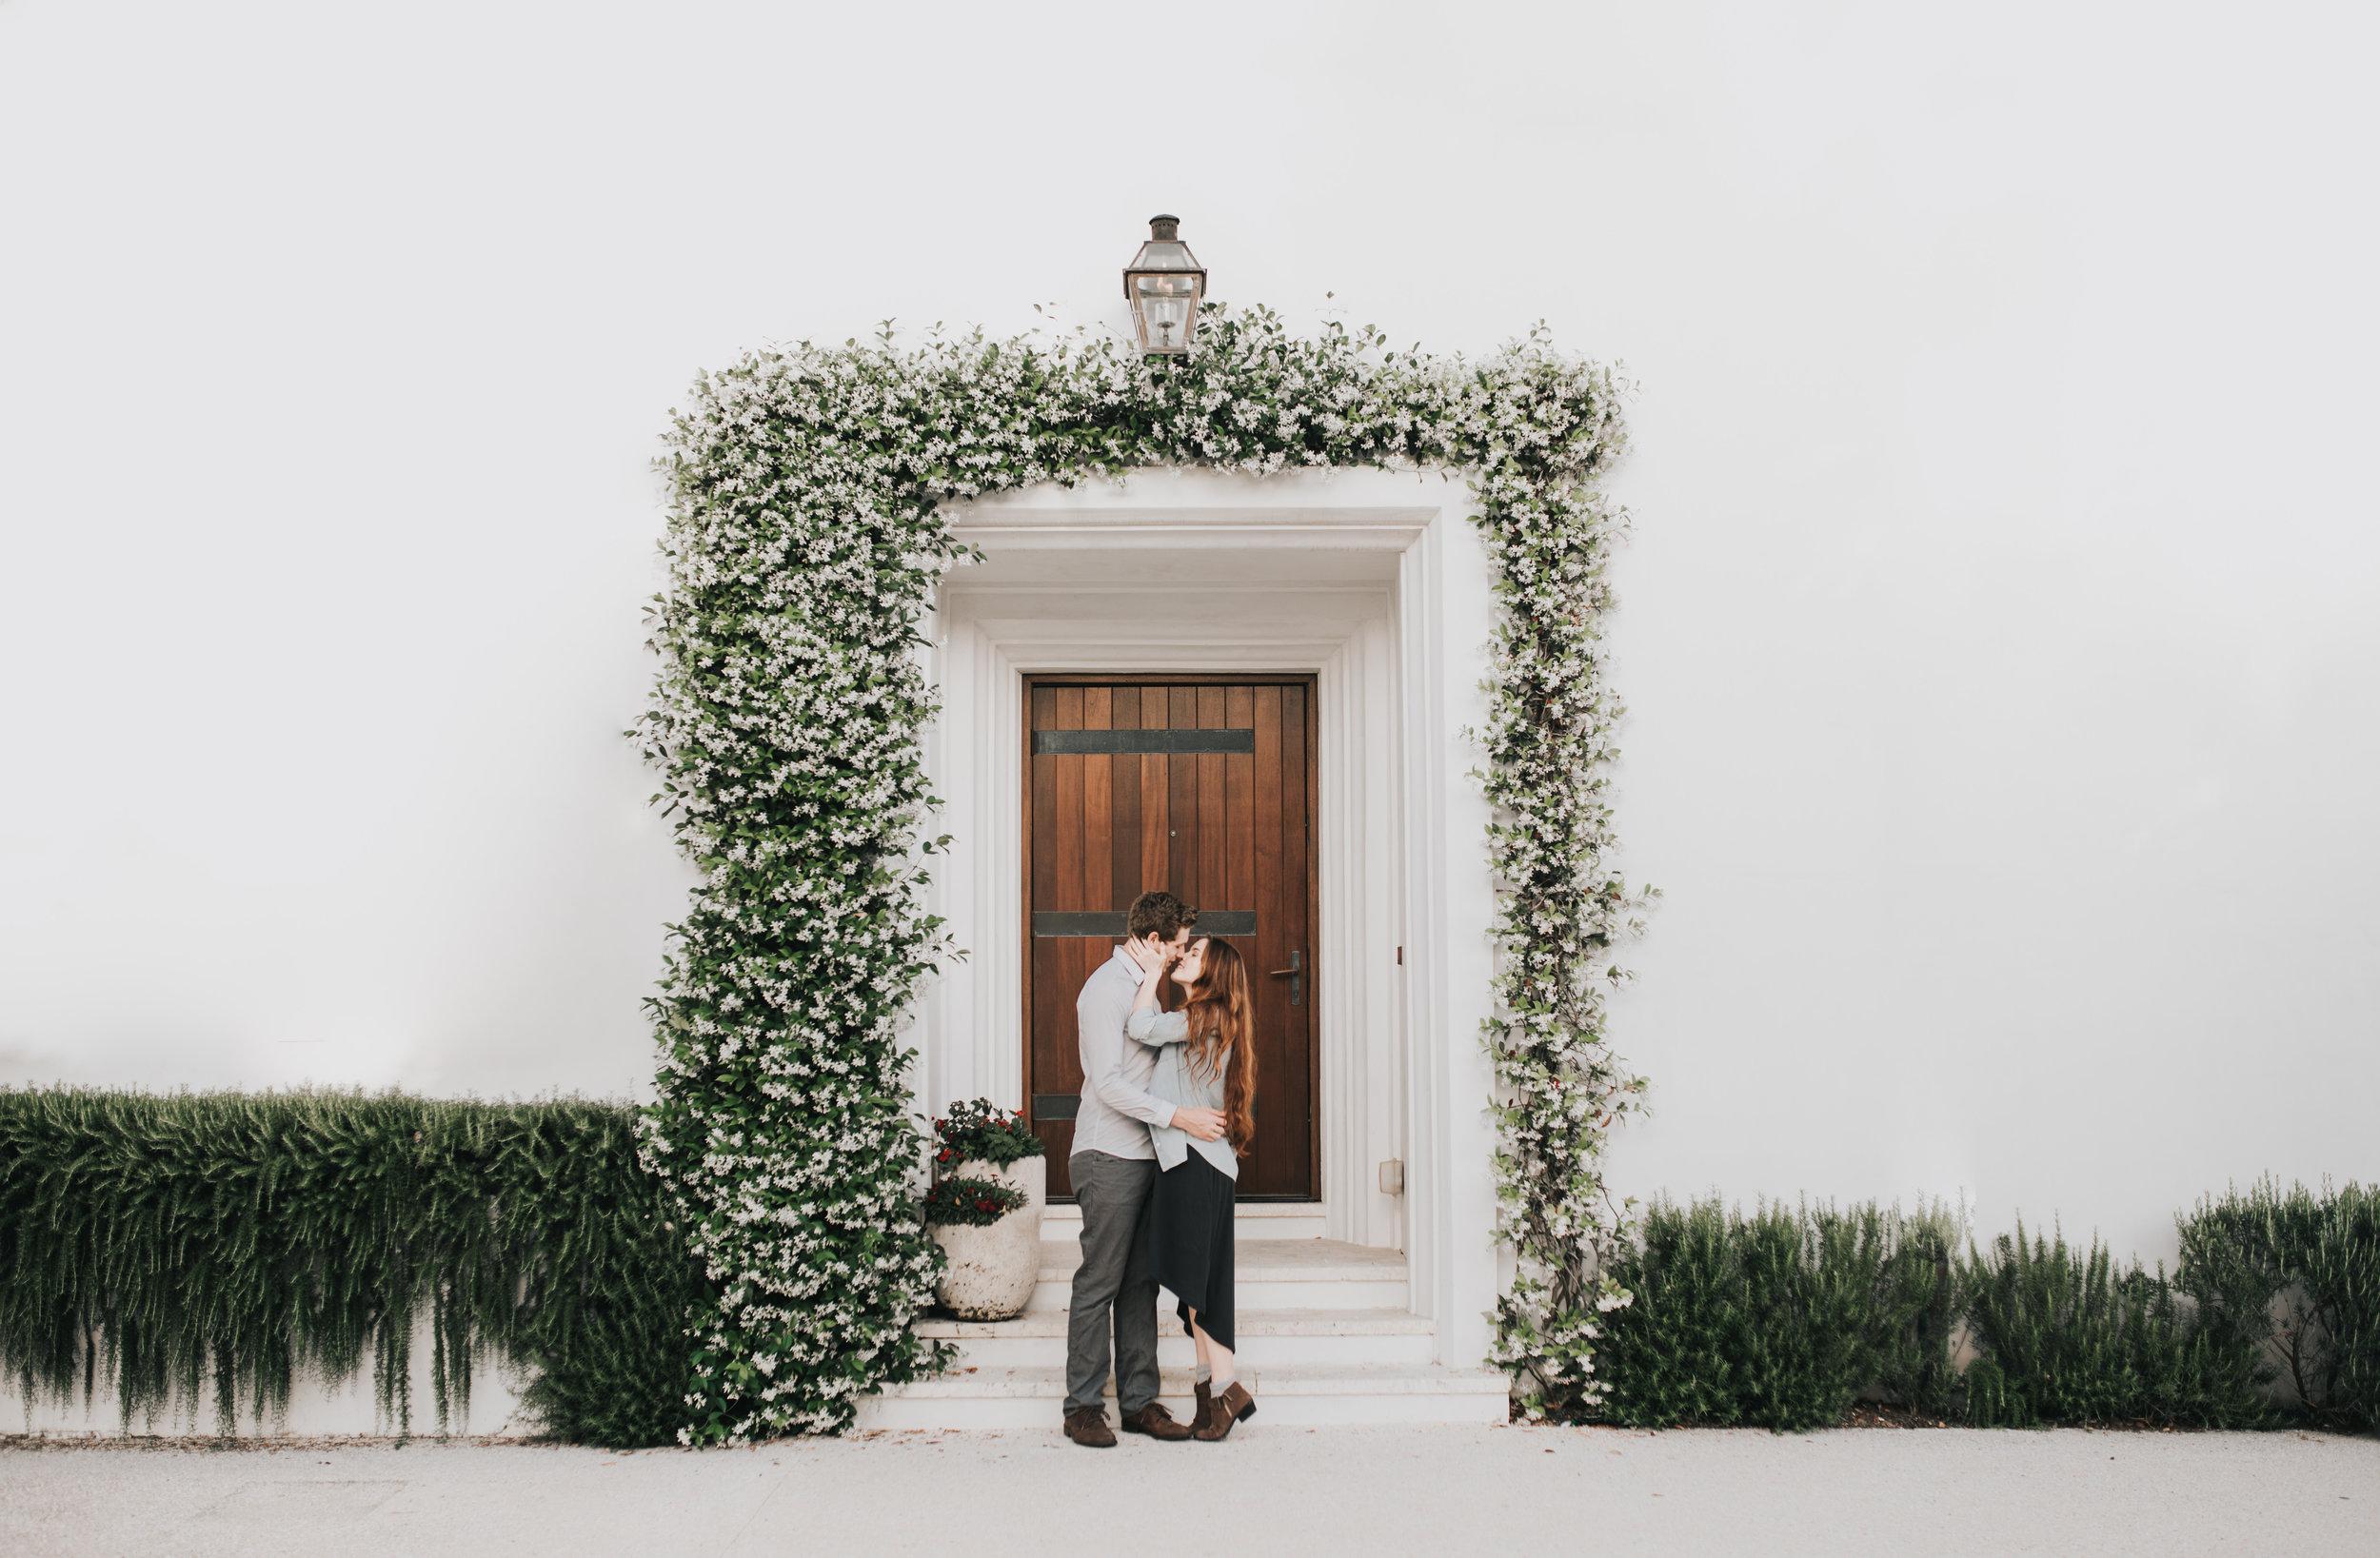 panama-city-beach-florida-wedding-photography-olivia-chandler-engagement-130.jpg